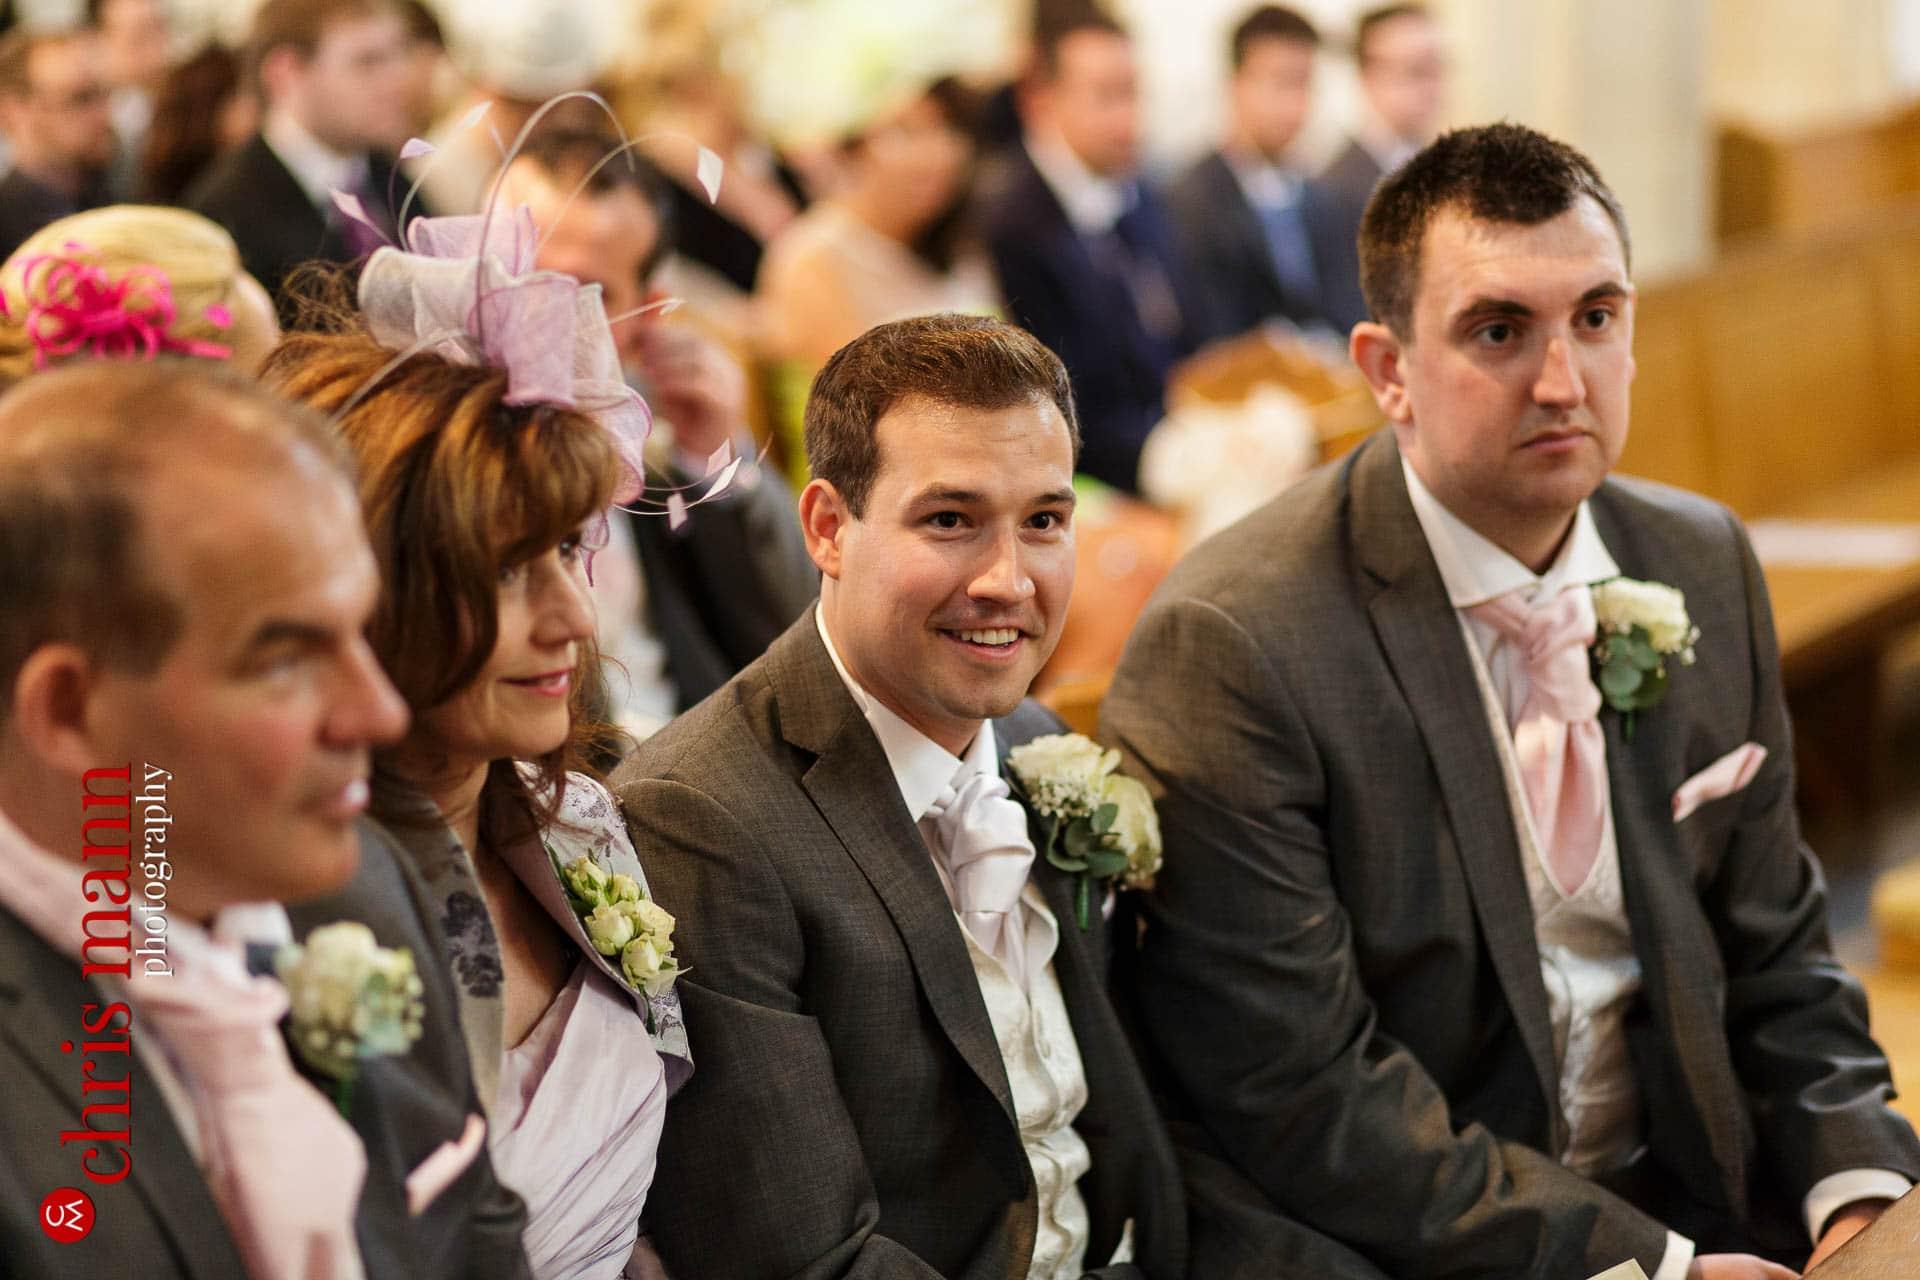 Brocket-Hall-wedding-photography-006